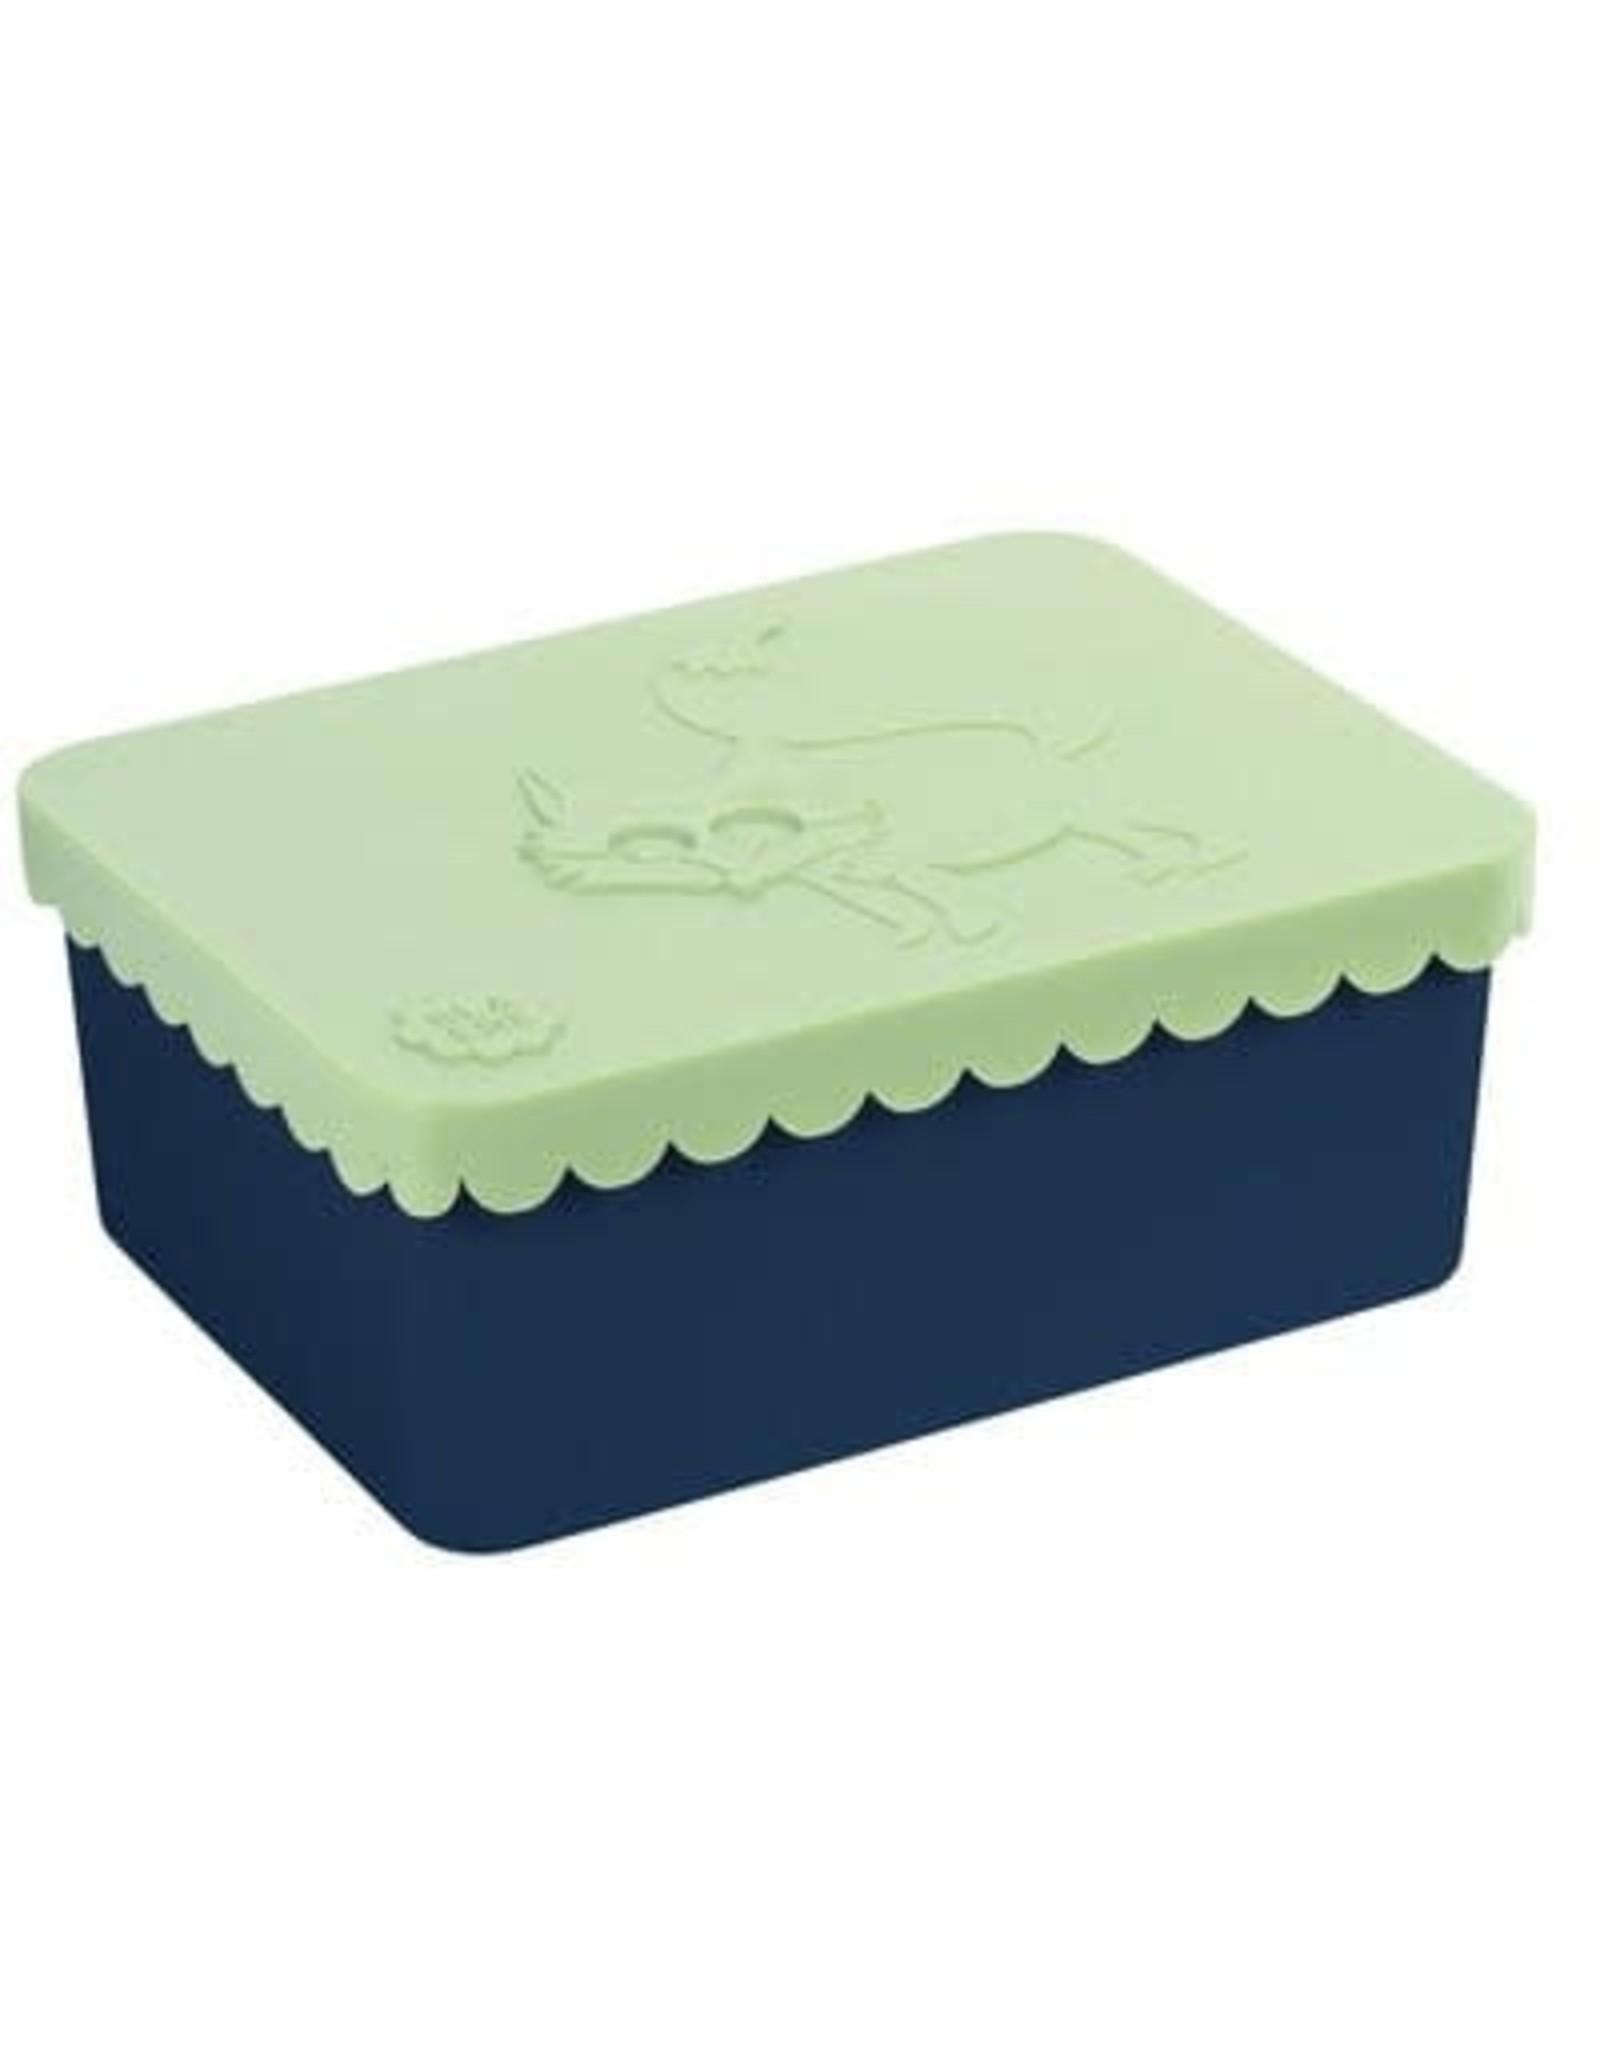 Blafre Blafre Lunch Box 1 comp Fox light green + navy